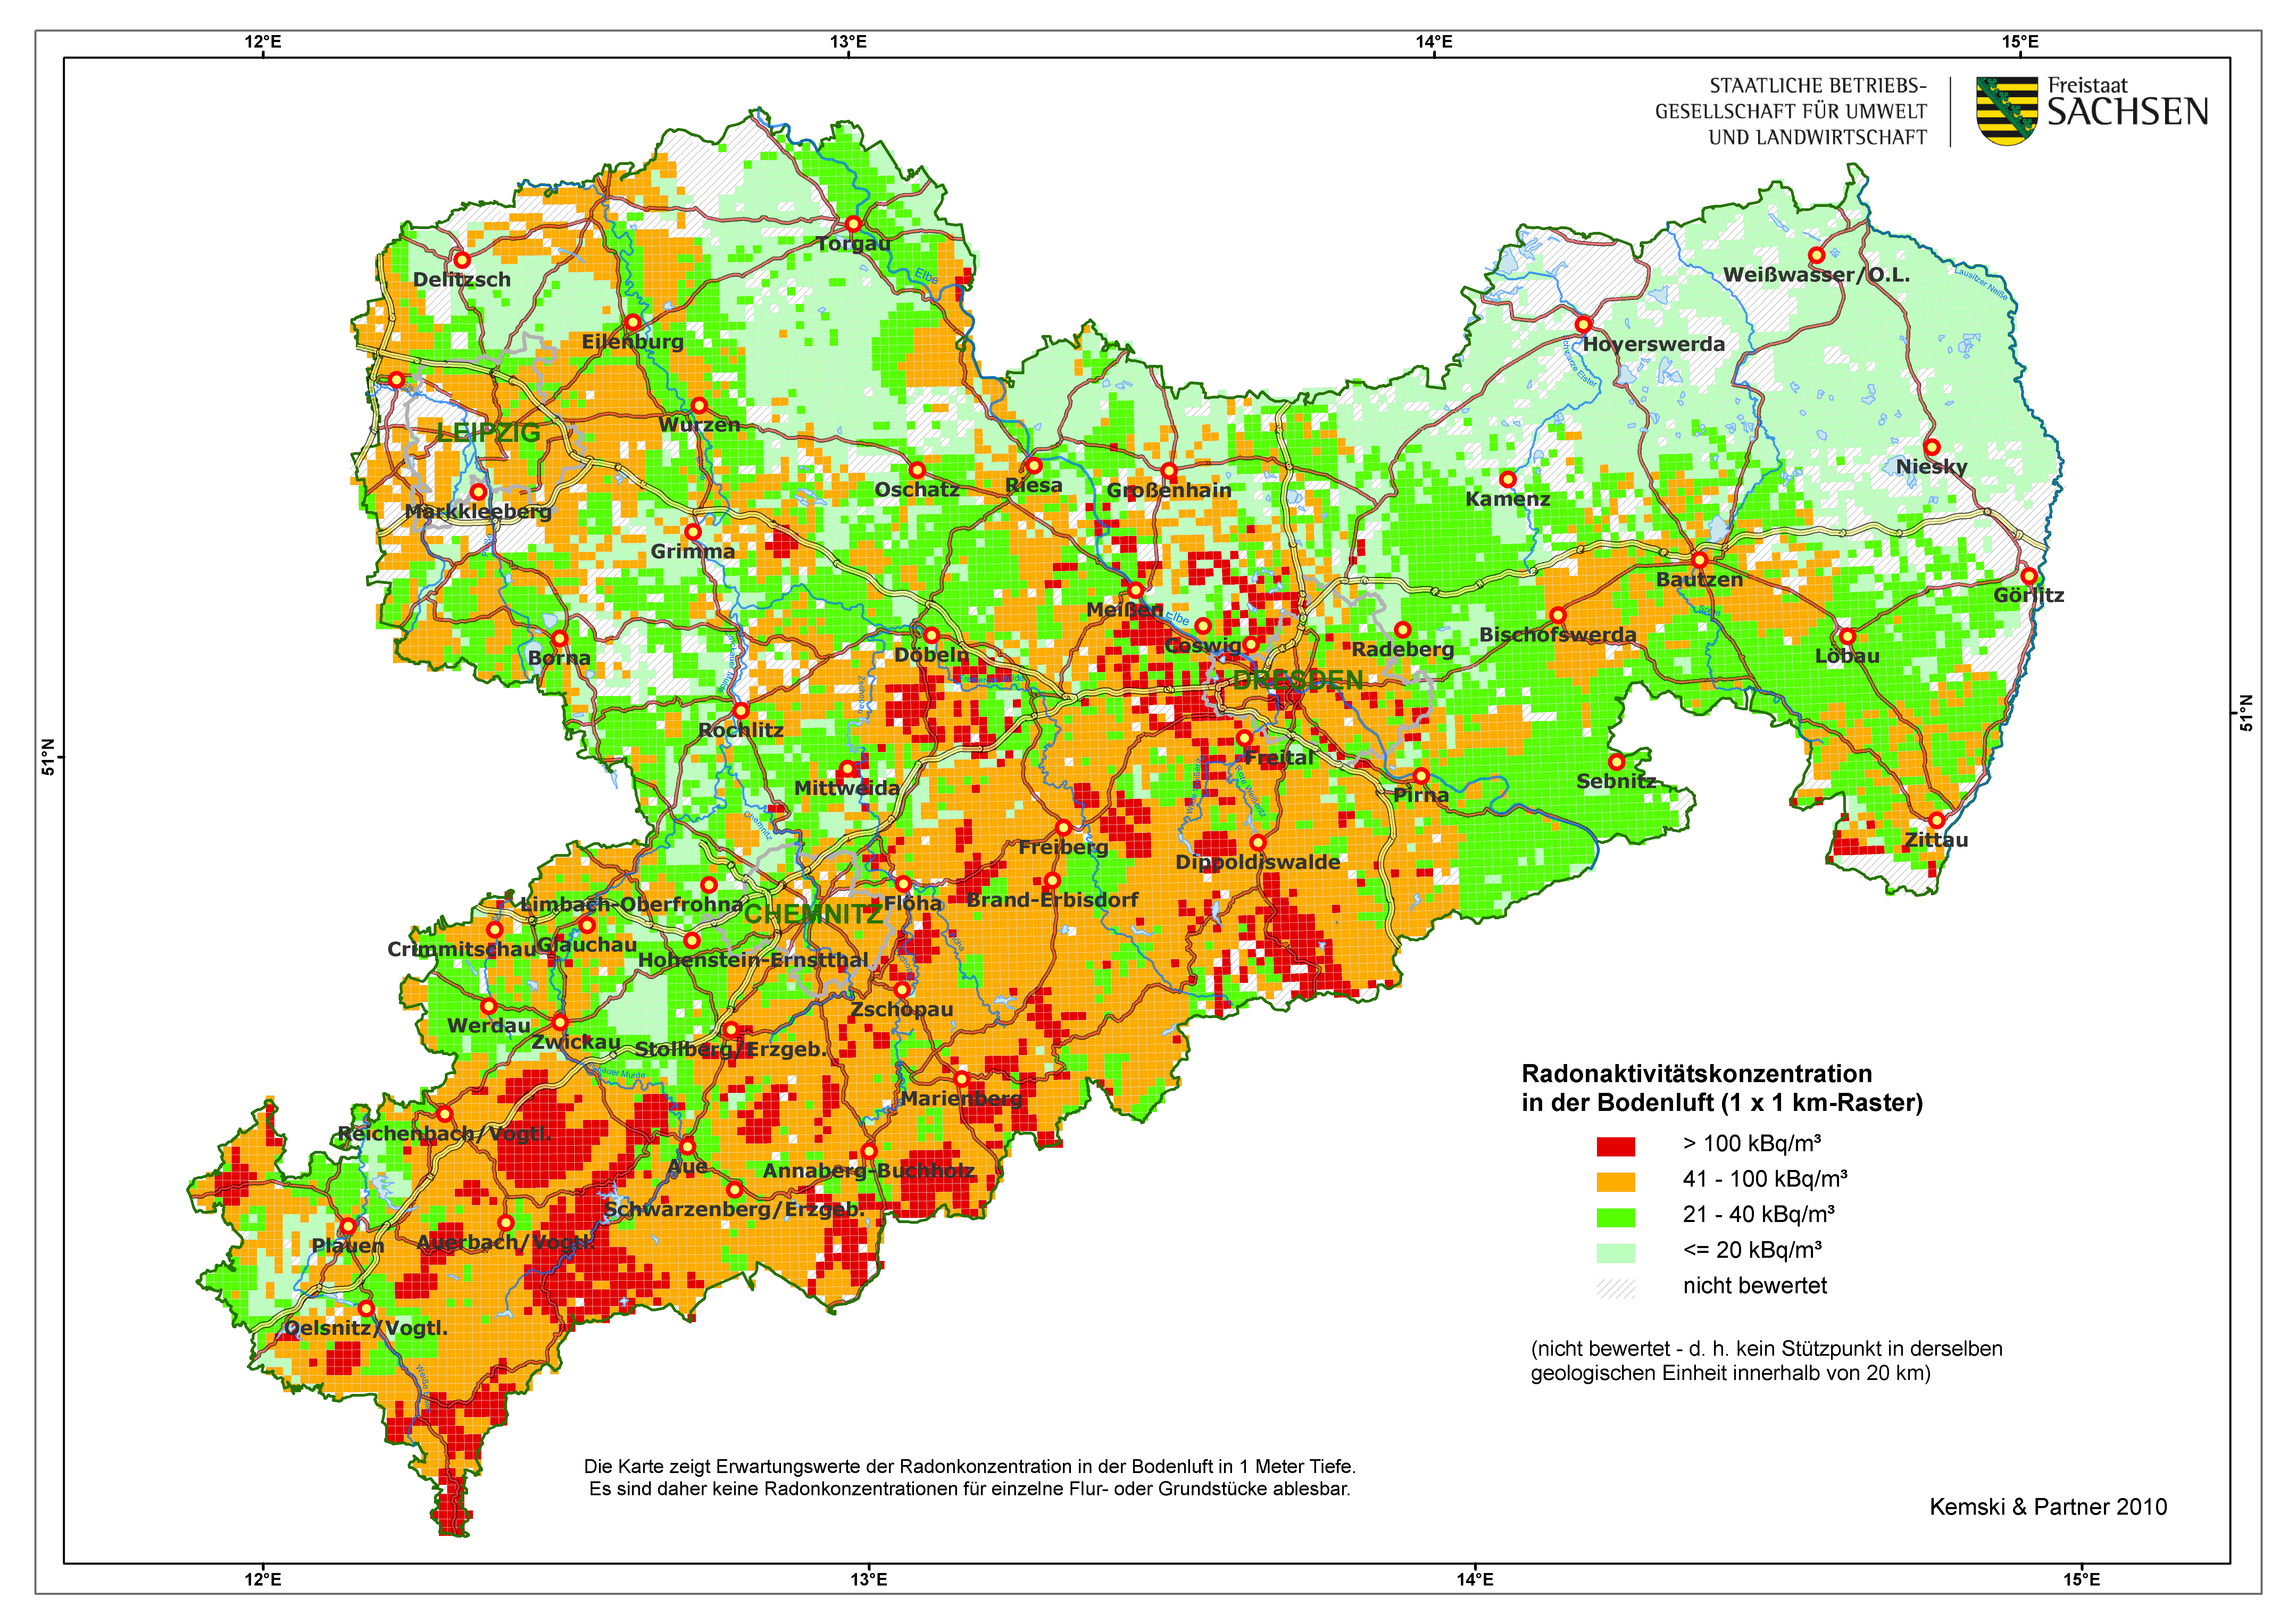 radonbelastung dresden karte Radonpotenzial in Sachsen   sachsen.de